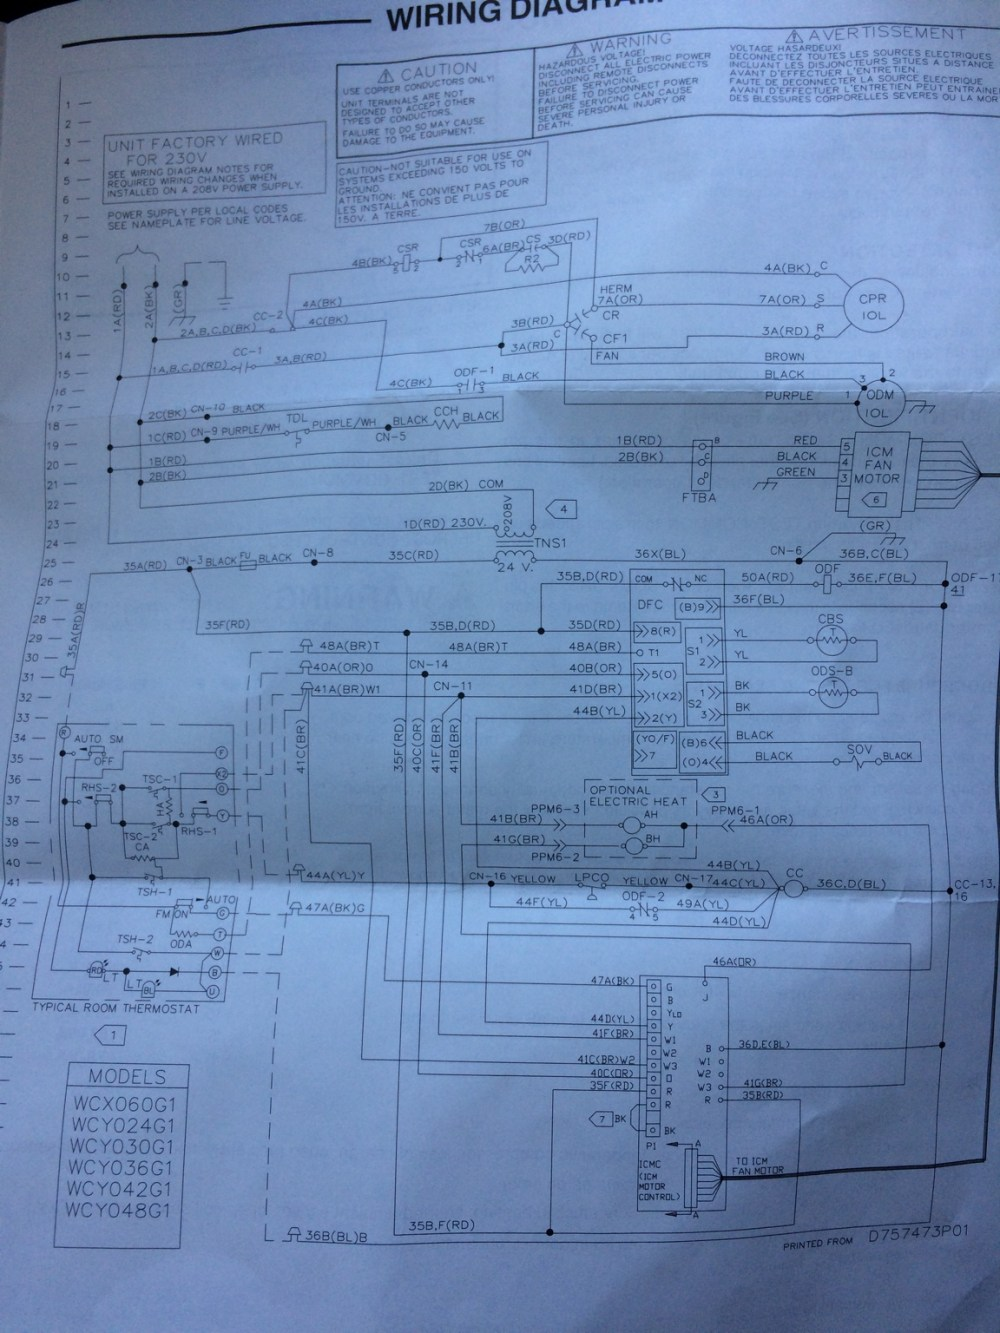 medium resolution of genteq eon wiring diagram trane wiring diagrams wiring genteq capacitor catalog genteq 27l570